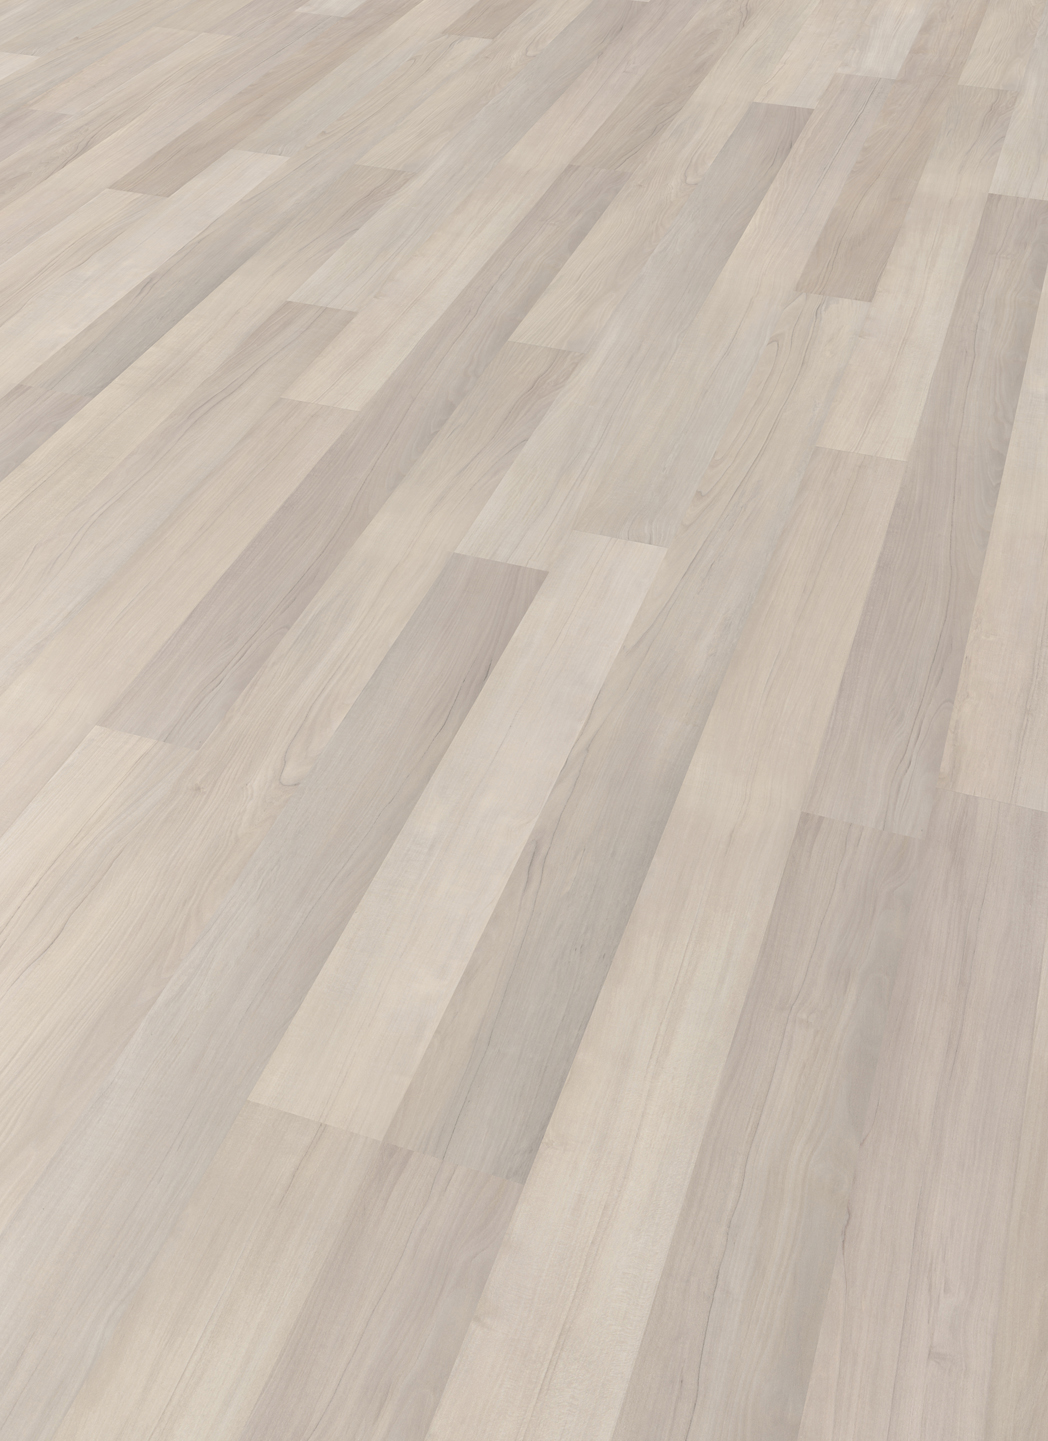 avatara yew grey beige man made wood floor wood4floors. Black Bedroom Furniture Sets. Home Design Ideas